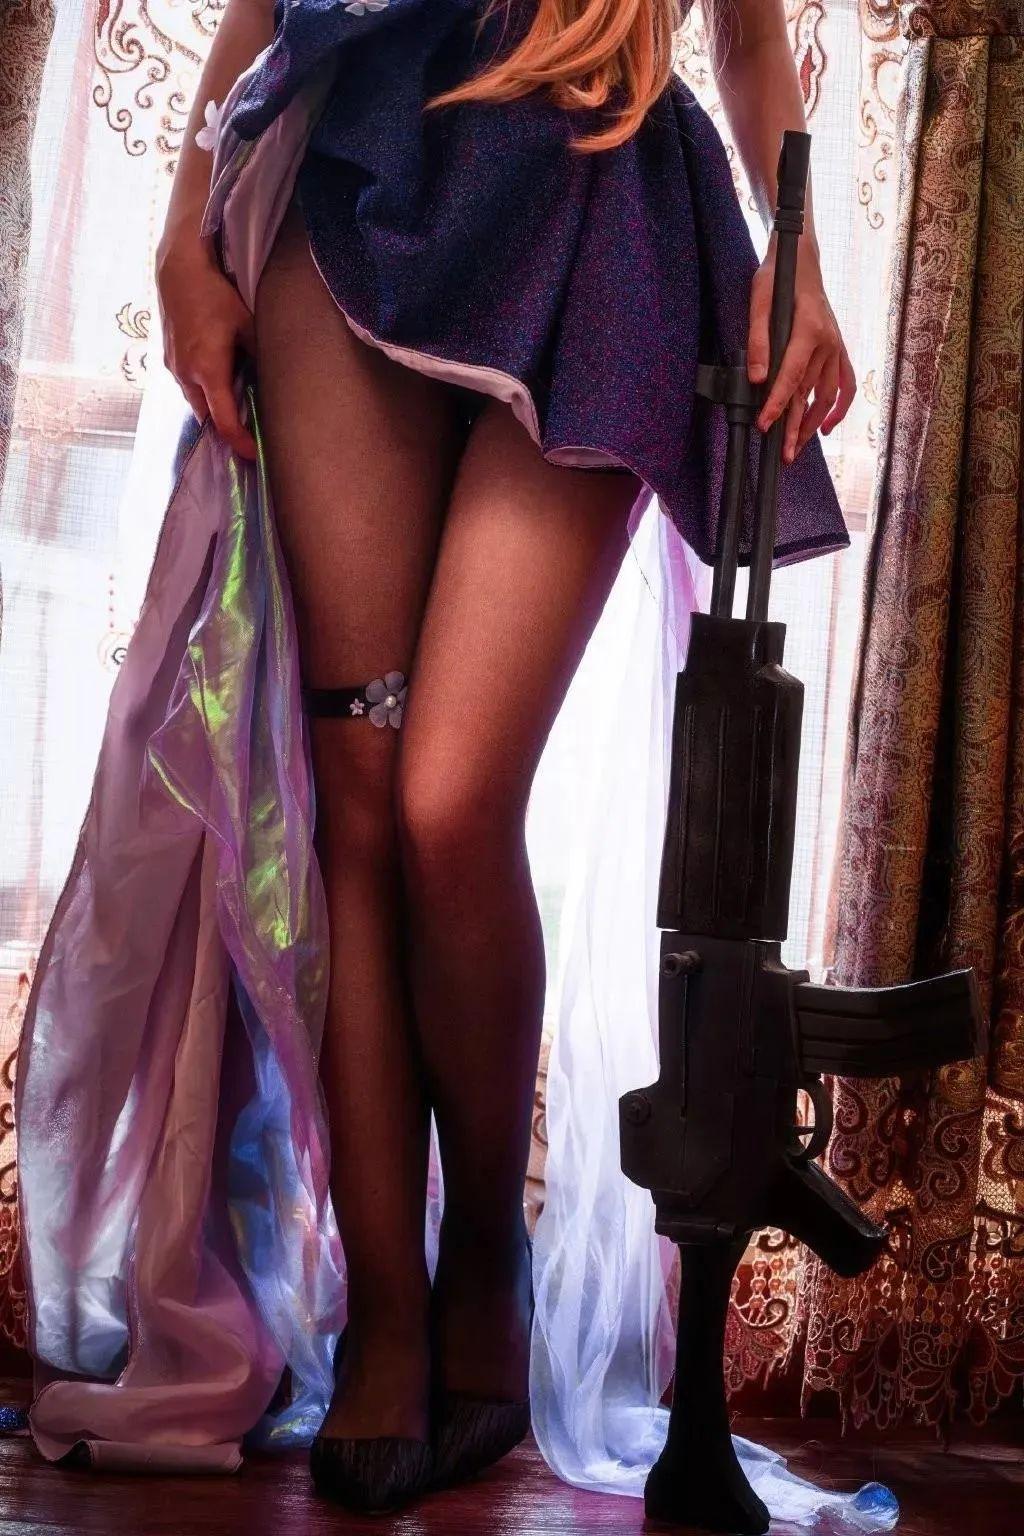 Cosplay—少女前线 K2,又是一双适合舔骨折的黑丝美腿_图片 No.6